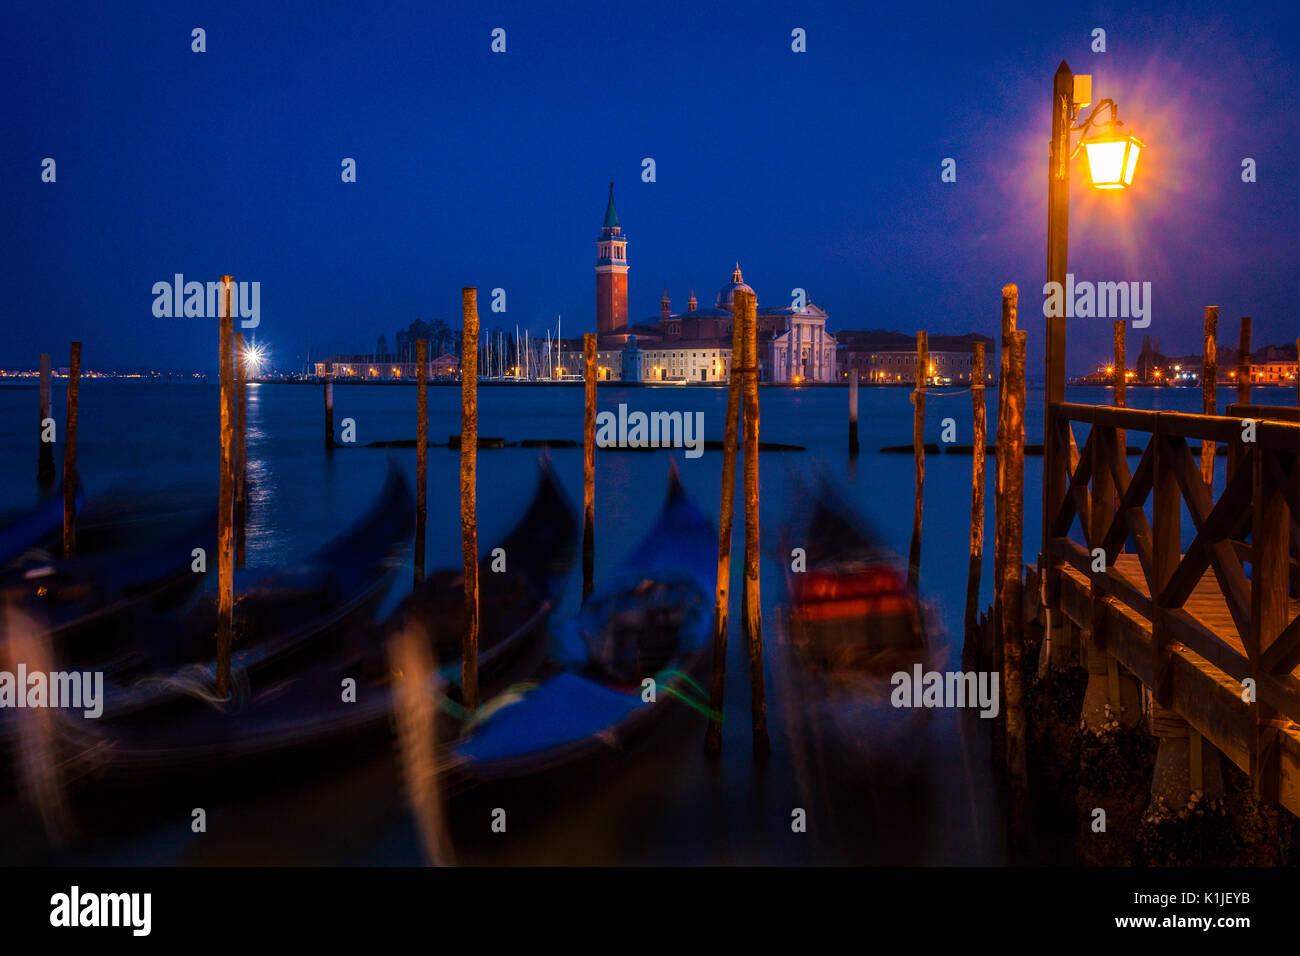 Gondolas at twilight with the island of San Giorgio Maggiore in the background. - Stock Image